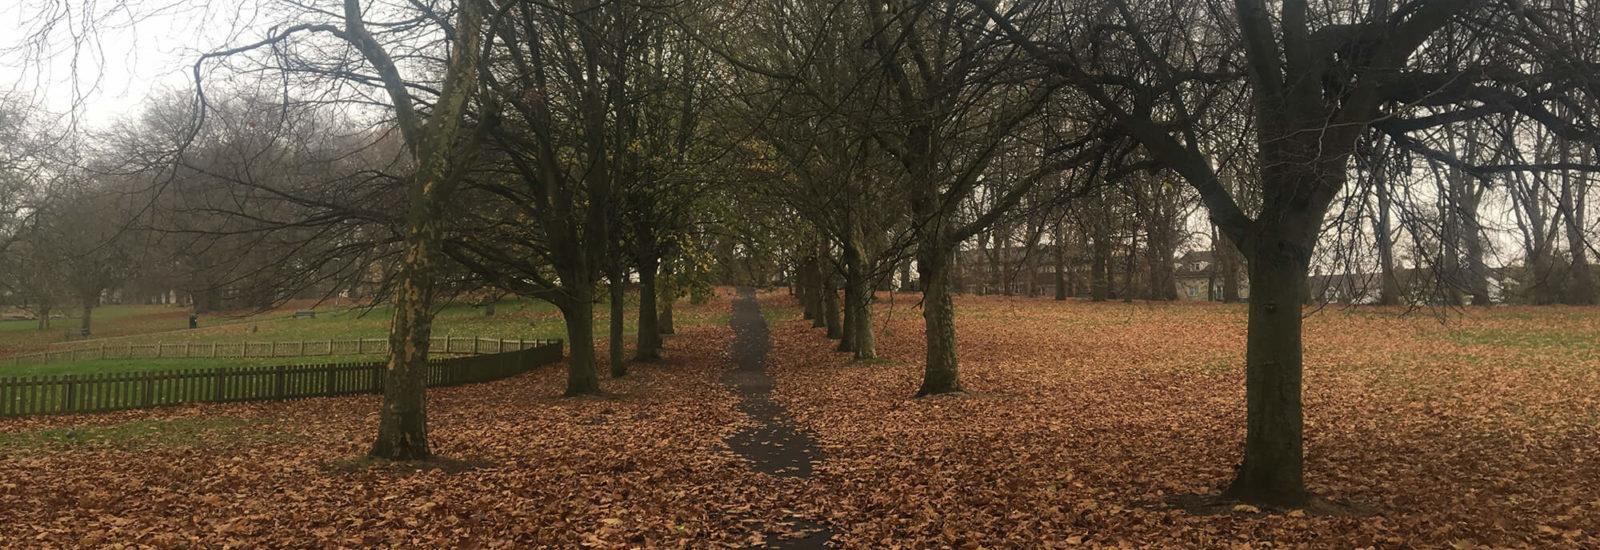 Image of St George Park